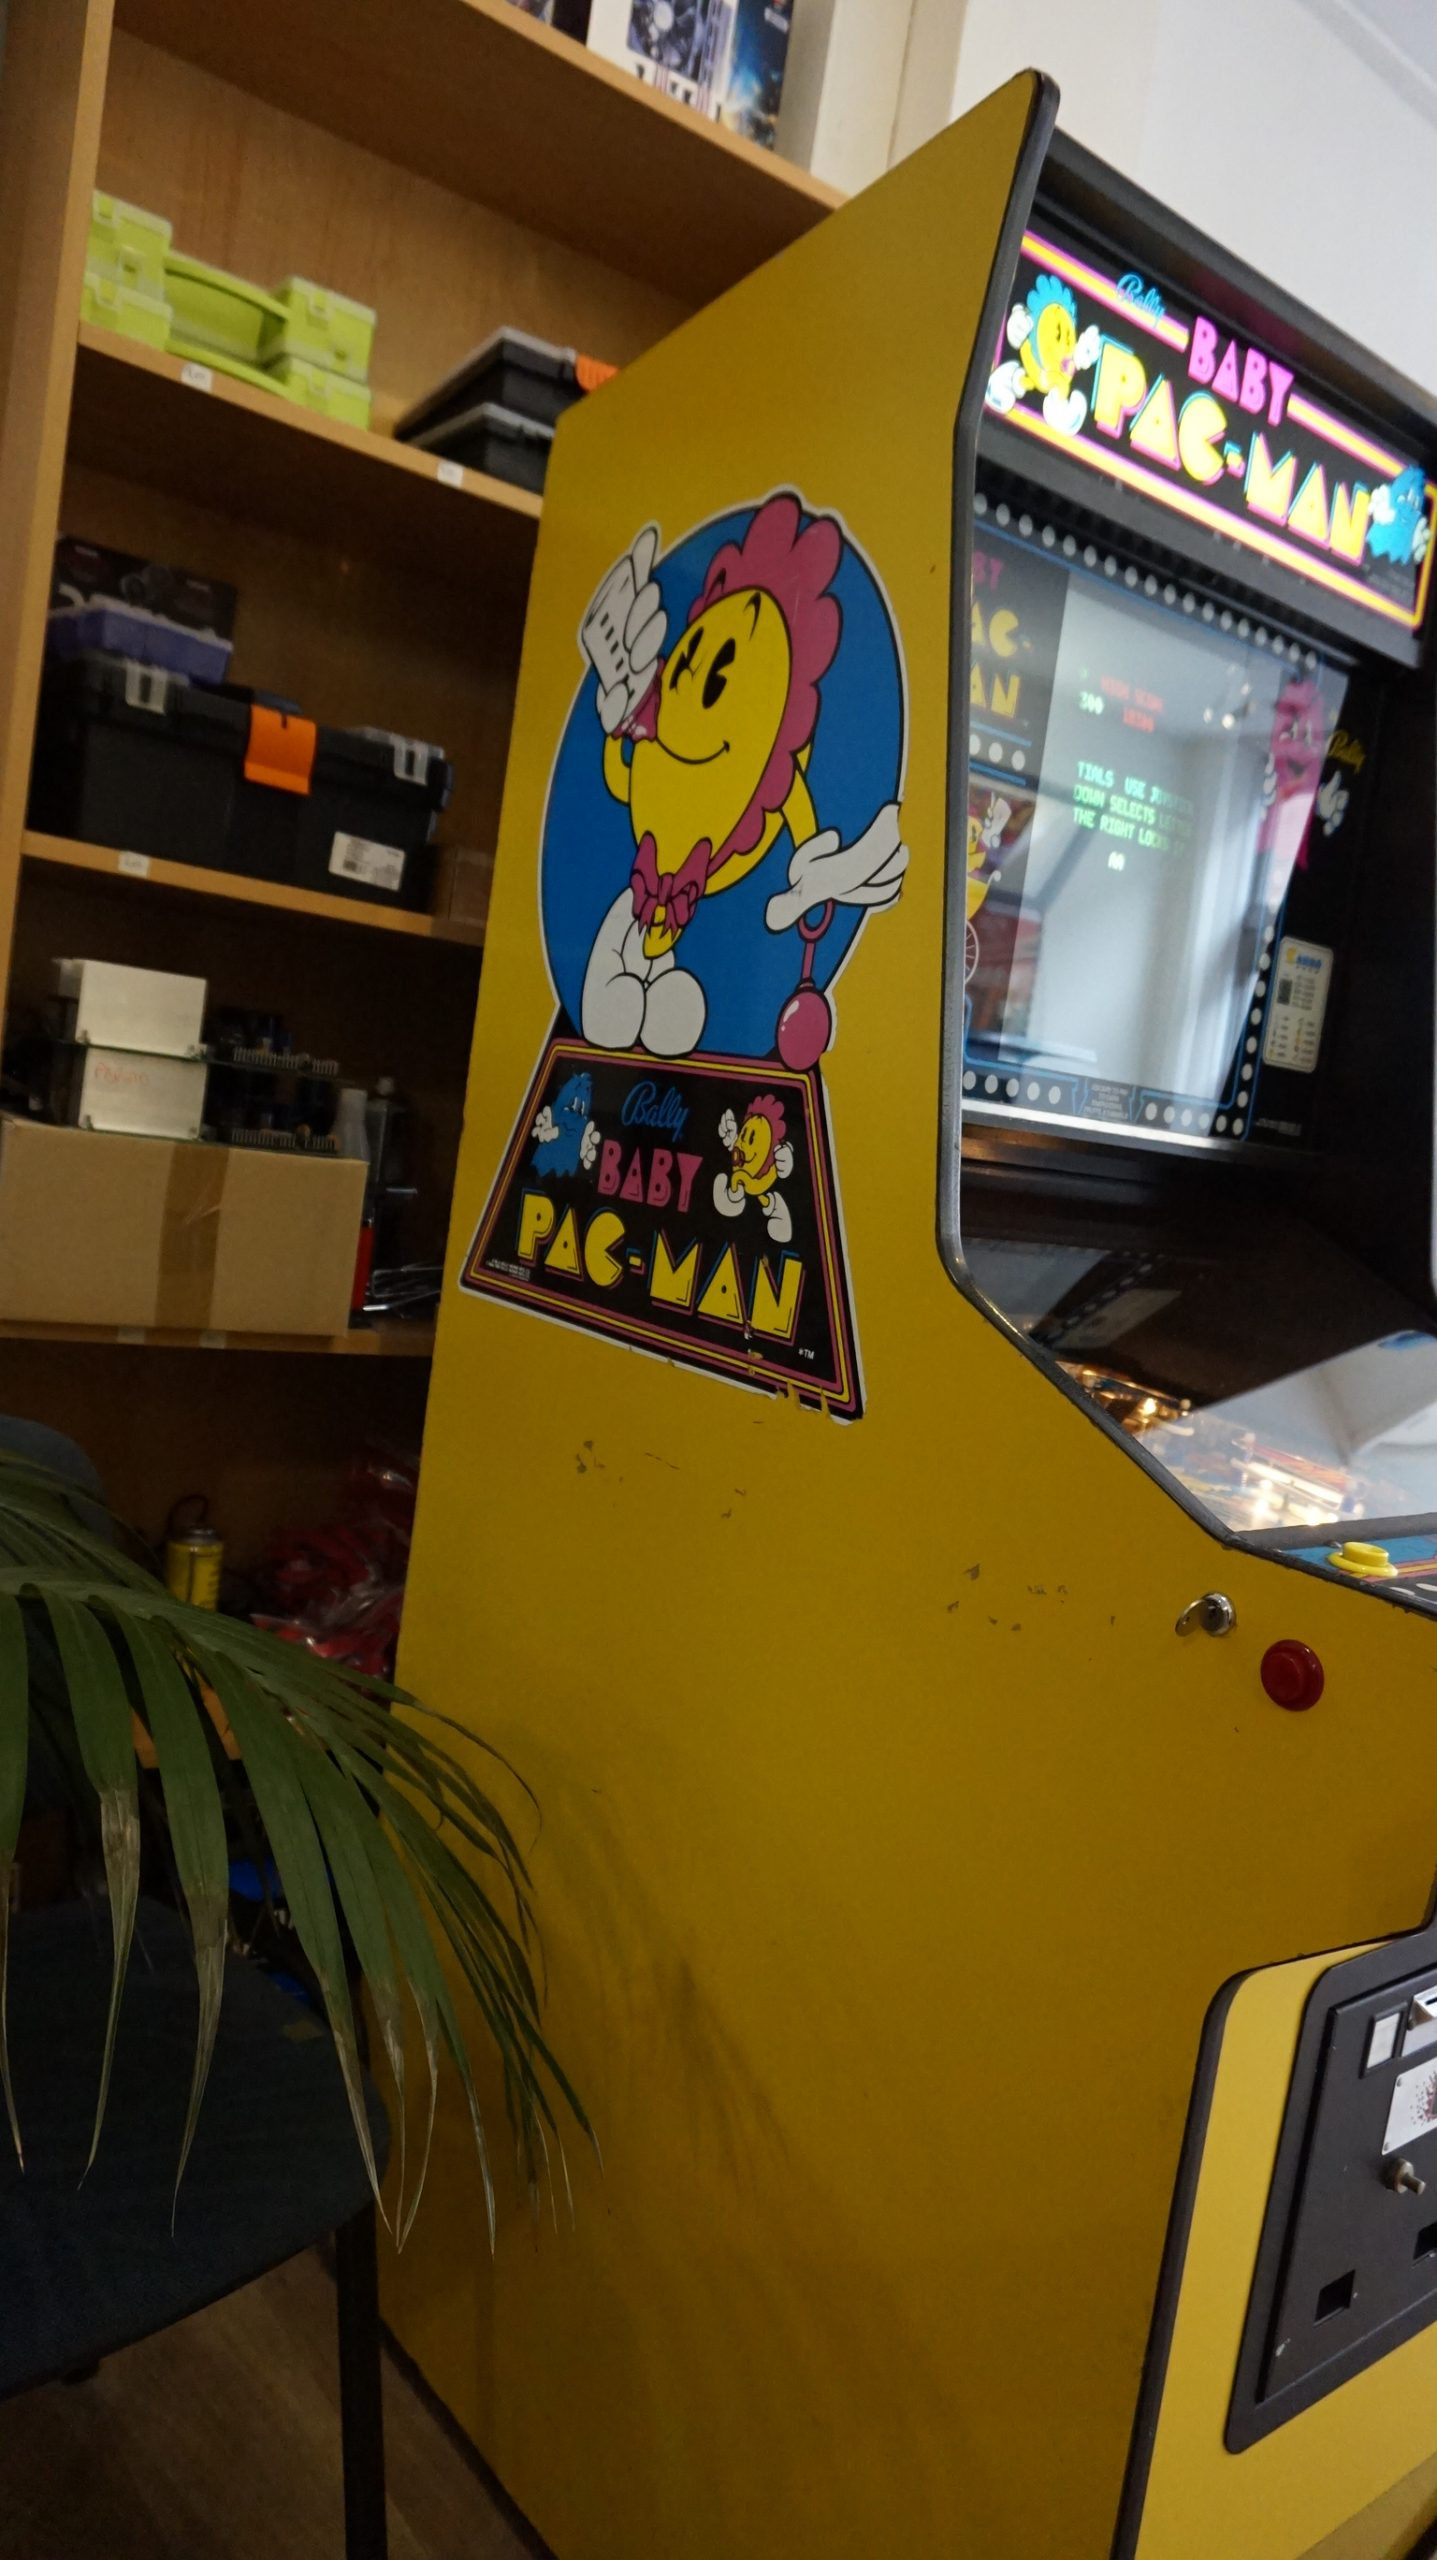 Baby Pac-Man | Bally | Kabinet